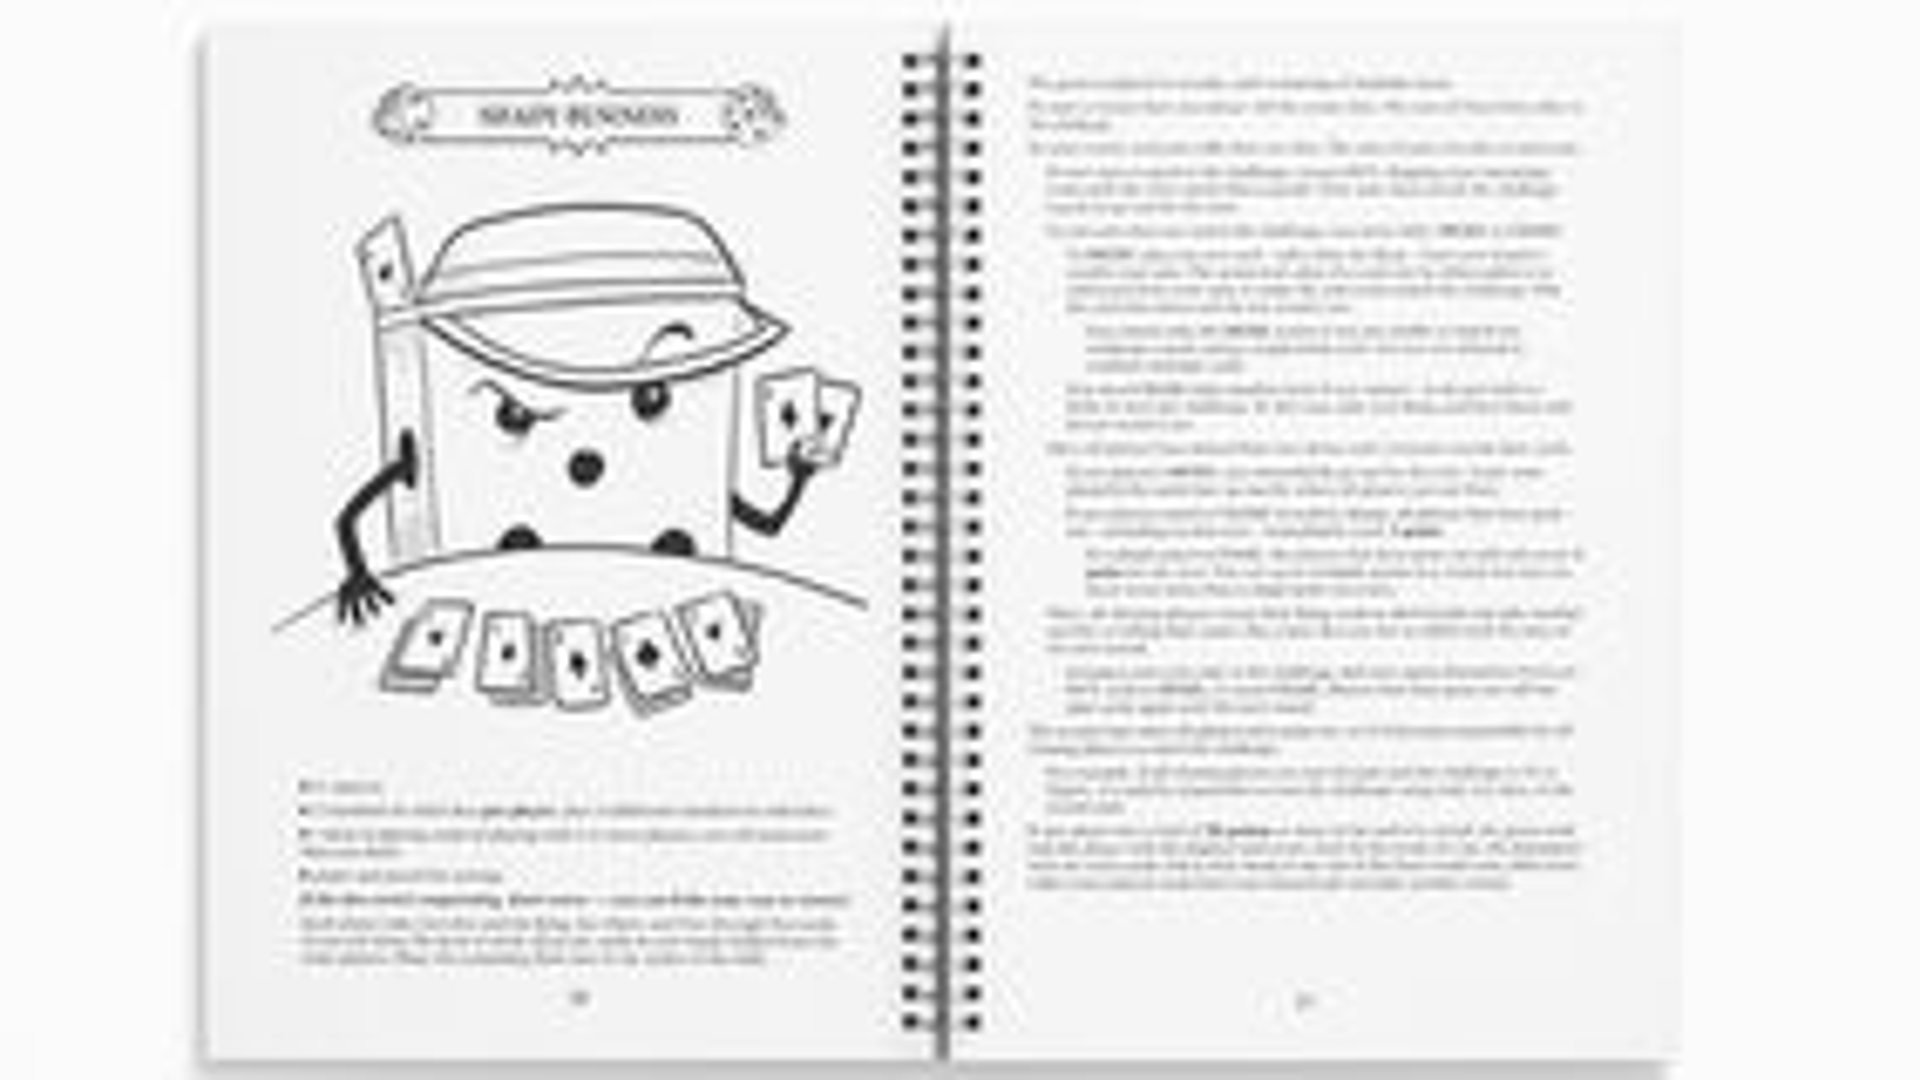 Random Fun Generator 2 book image 2